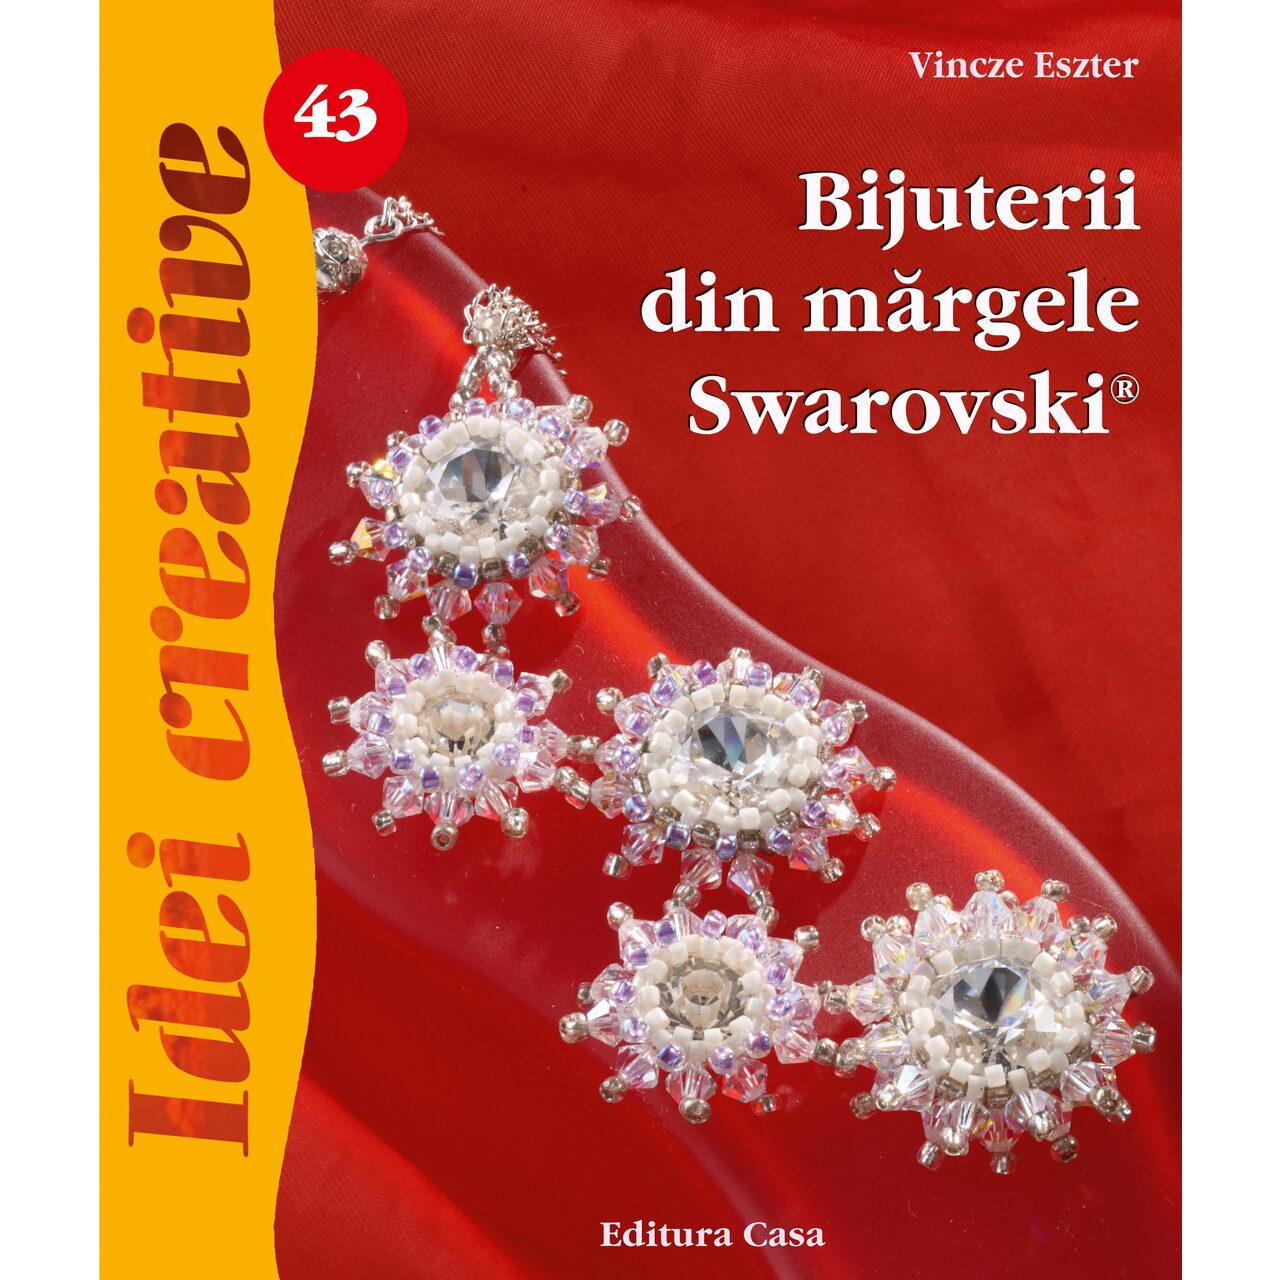 Bijuterii din mărgele Swarovski - Idei Creative nr. 43 imagine edituracasa.ro